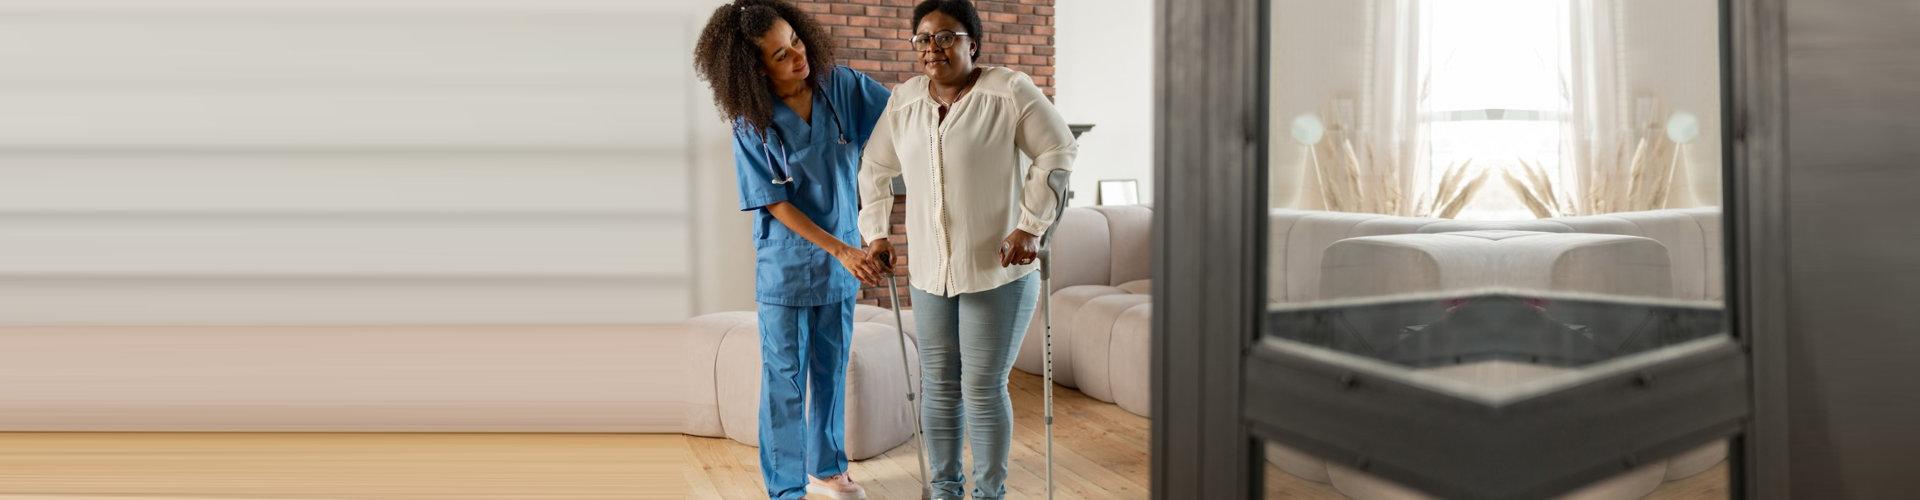 female nurse assisting senior woman walking